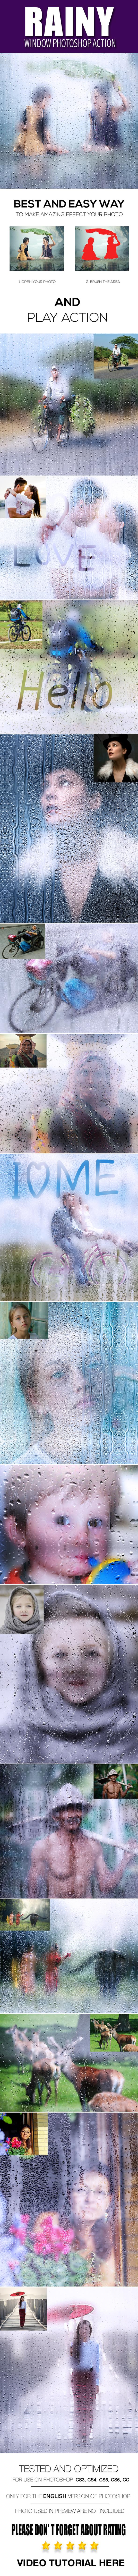 Rainy Window Photoshop Action - Photo Effects Actions